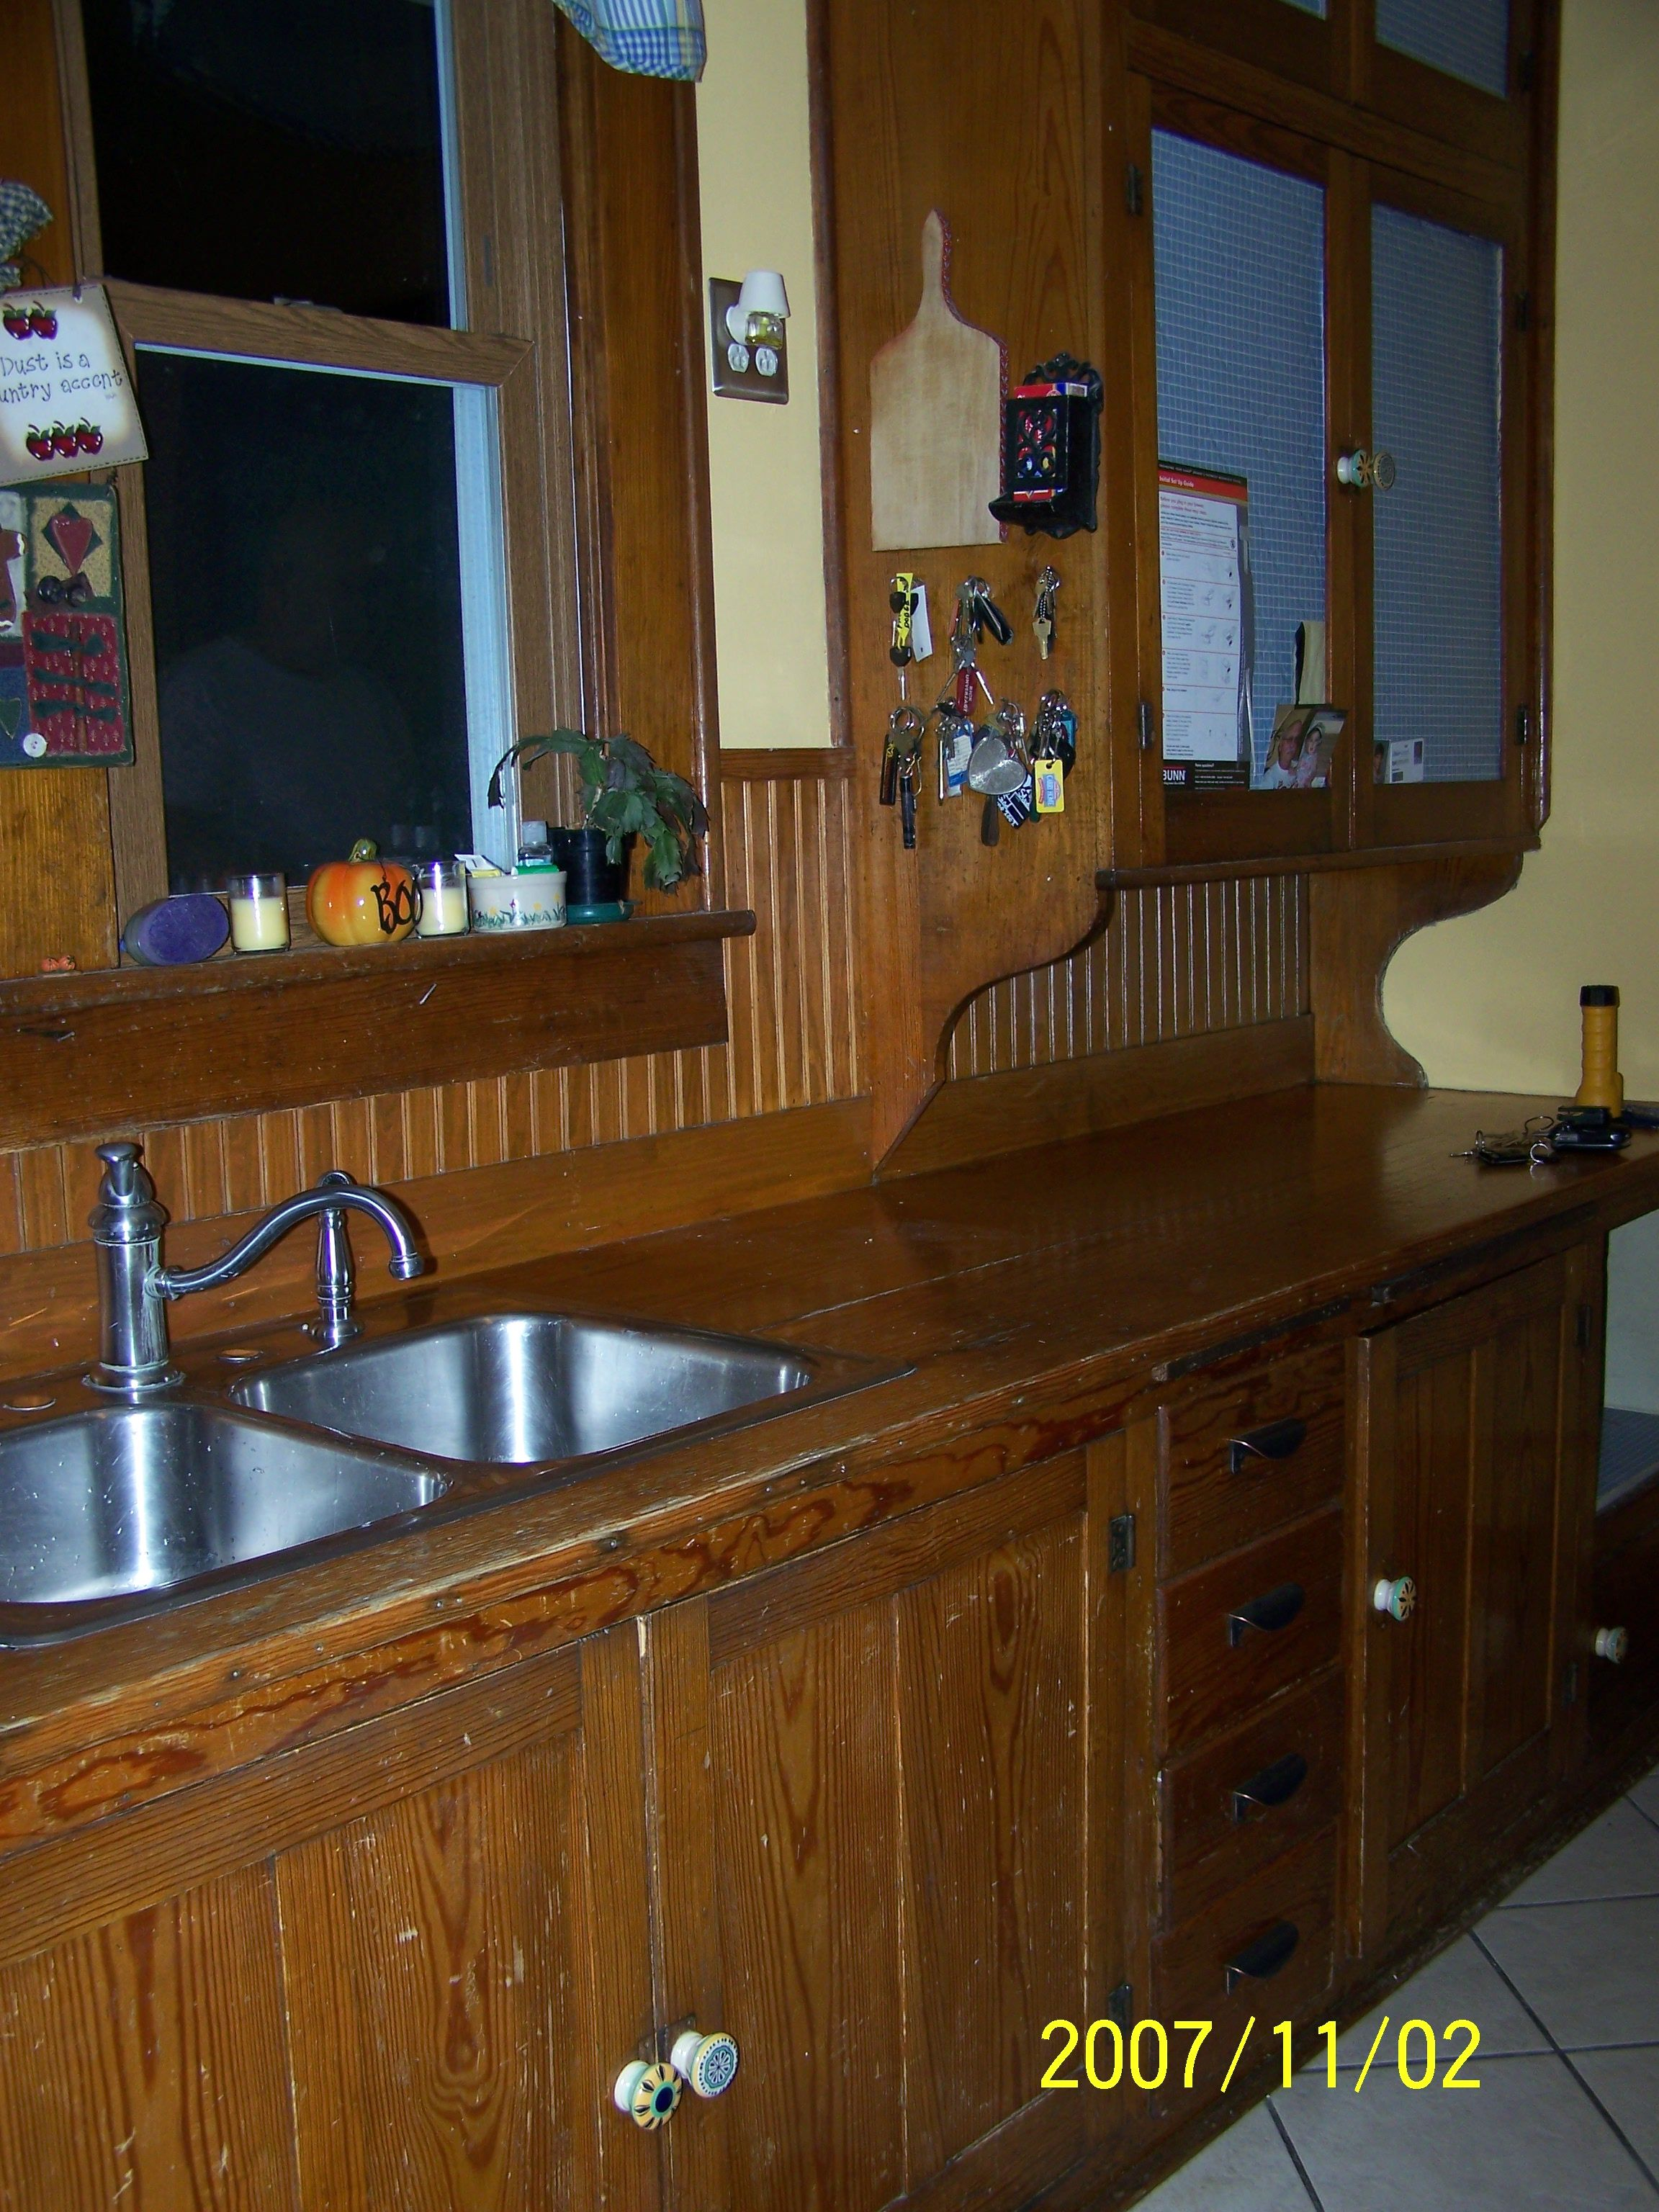 Original Fir Cabinets In A 1923 Bungalow Kitchen Bungalow Kitchen Kitchen Layout Retro Kitchen